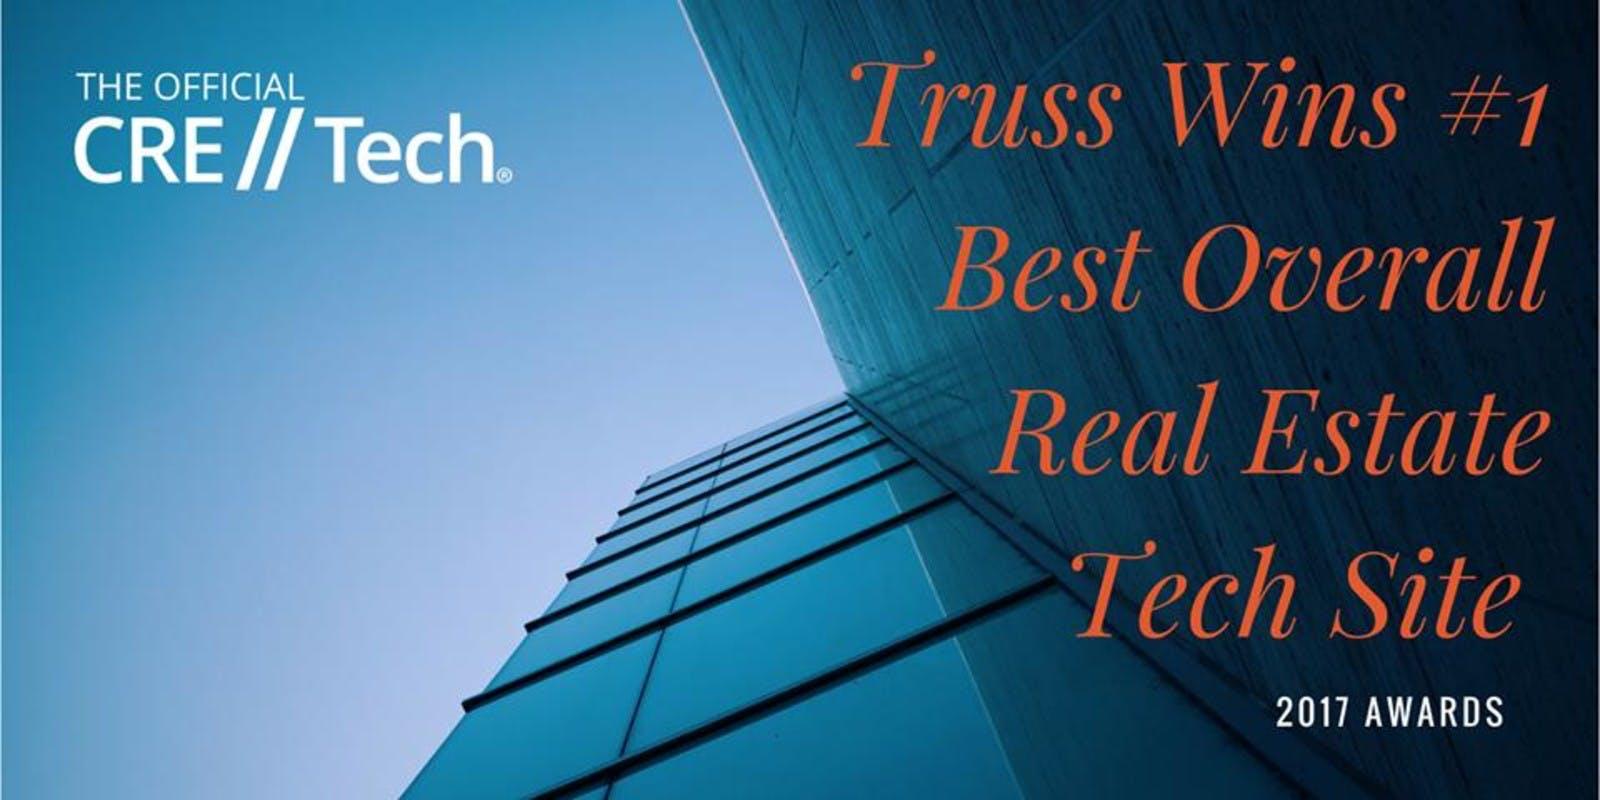 CRE//Tech - Truss Wins 1st - Best Overall Real Estate Tech Site - 2017